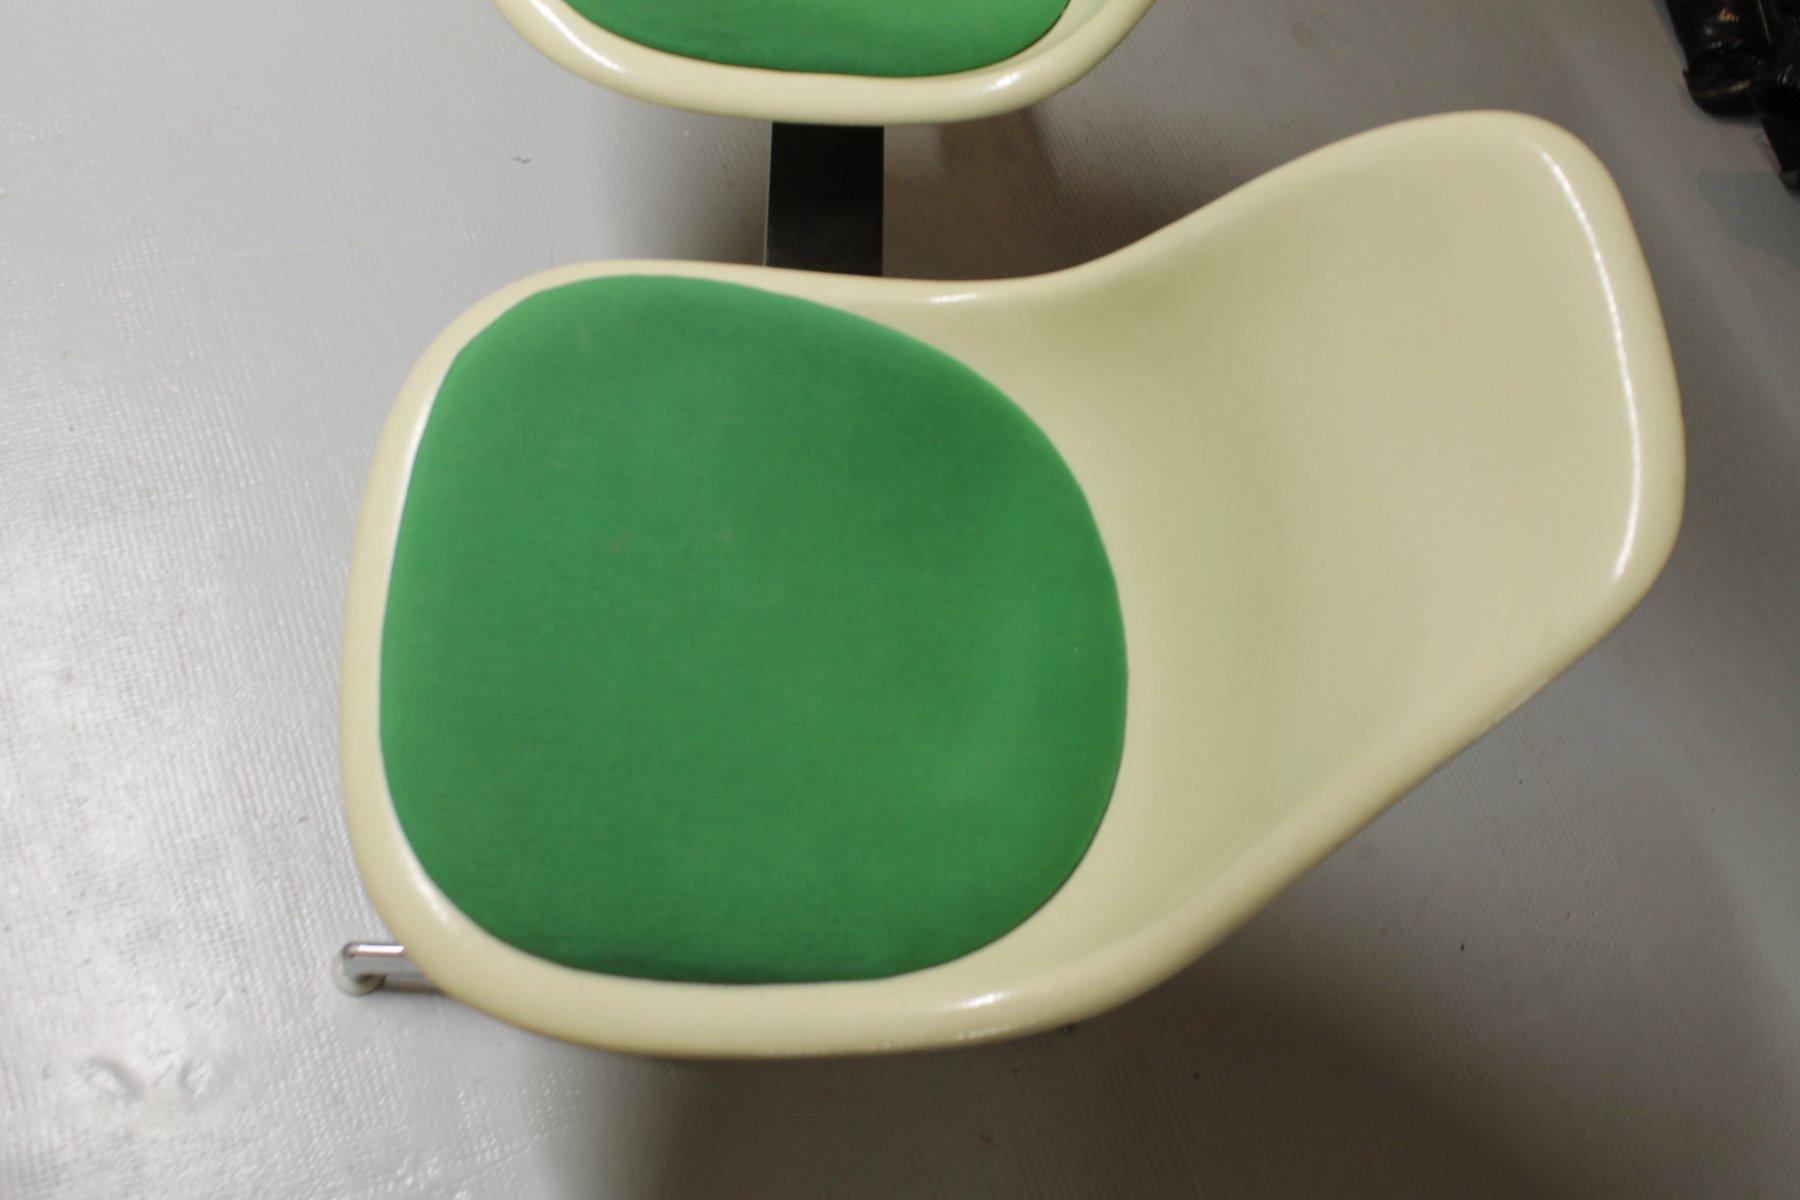 fiberglas bank von charles ray eames 1960er bei pamono kaufen. Black Bedroom Furniture Sets. Home Design Ideas